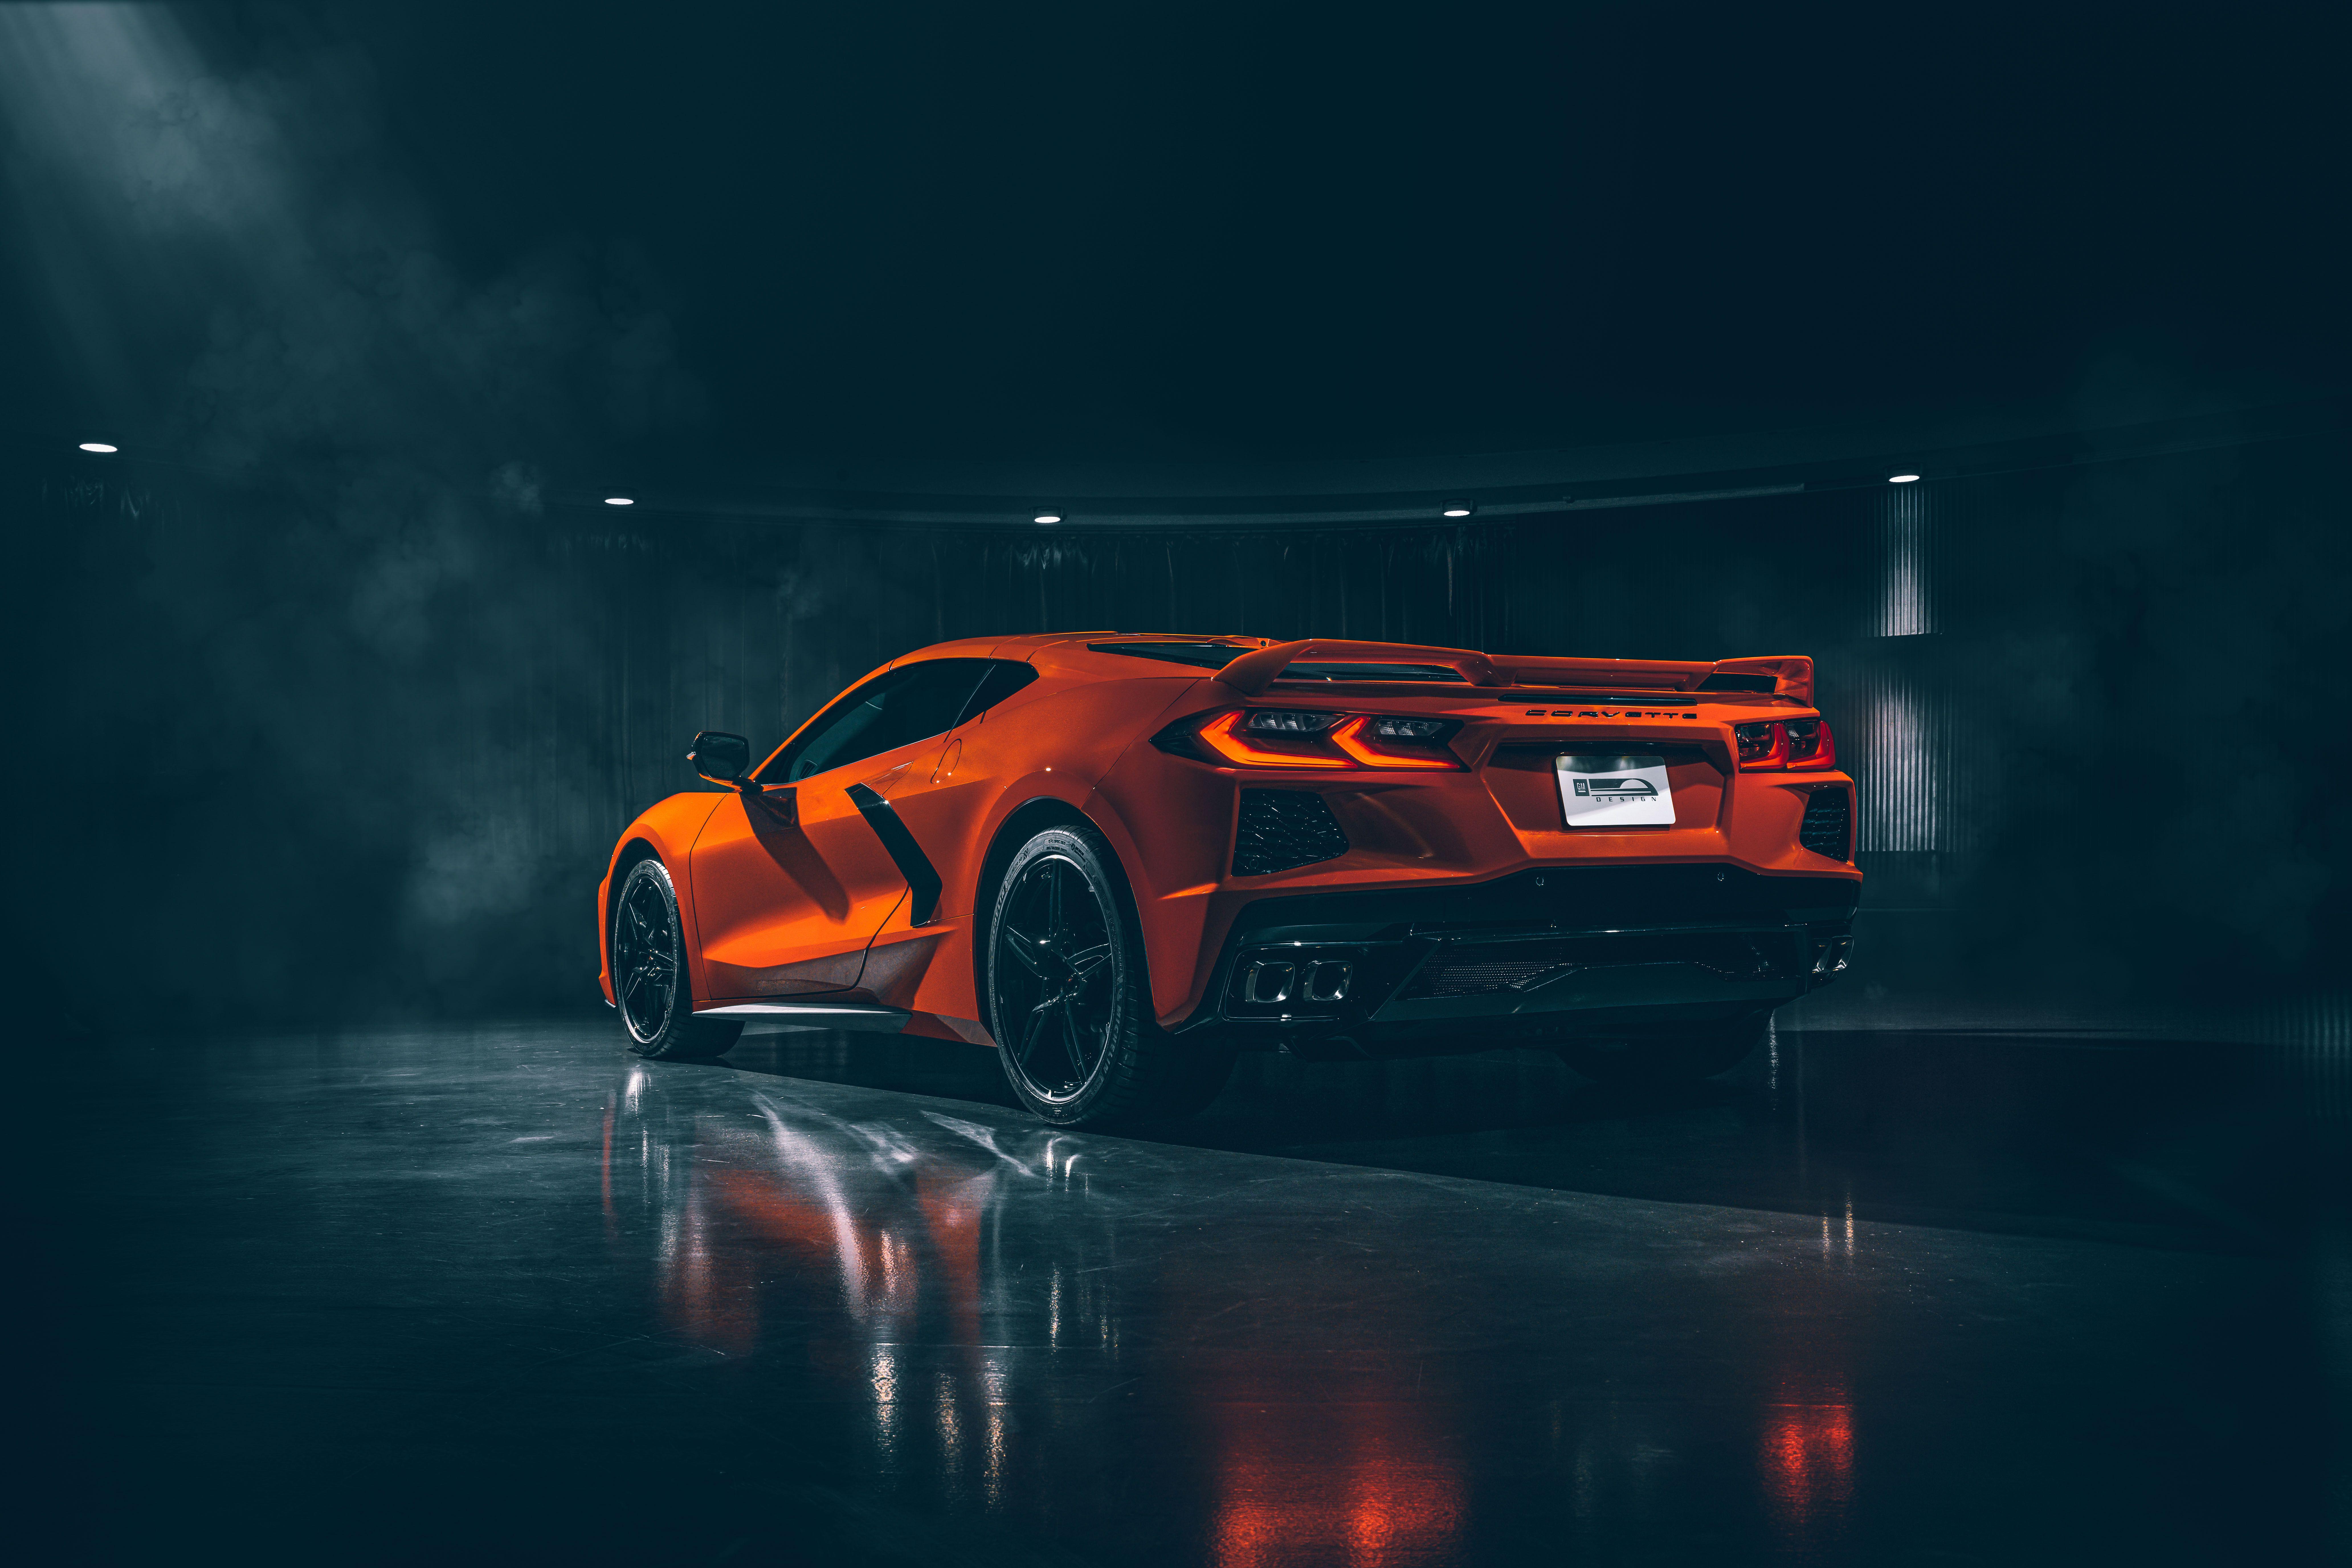 2020 Chevrolet Corvette Stingray C8 Rear, HD Cars, 4k ...